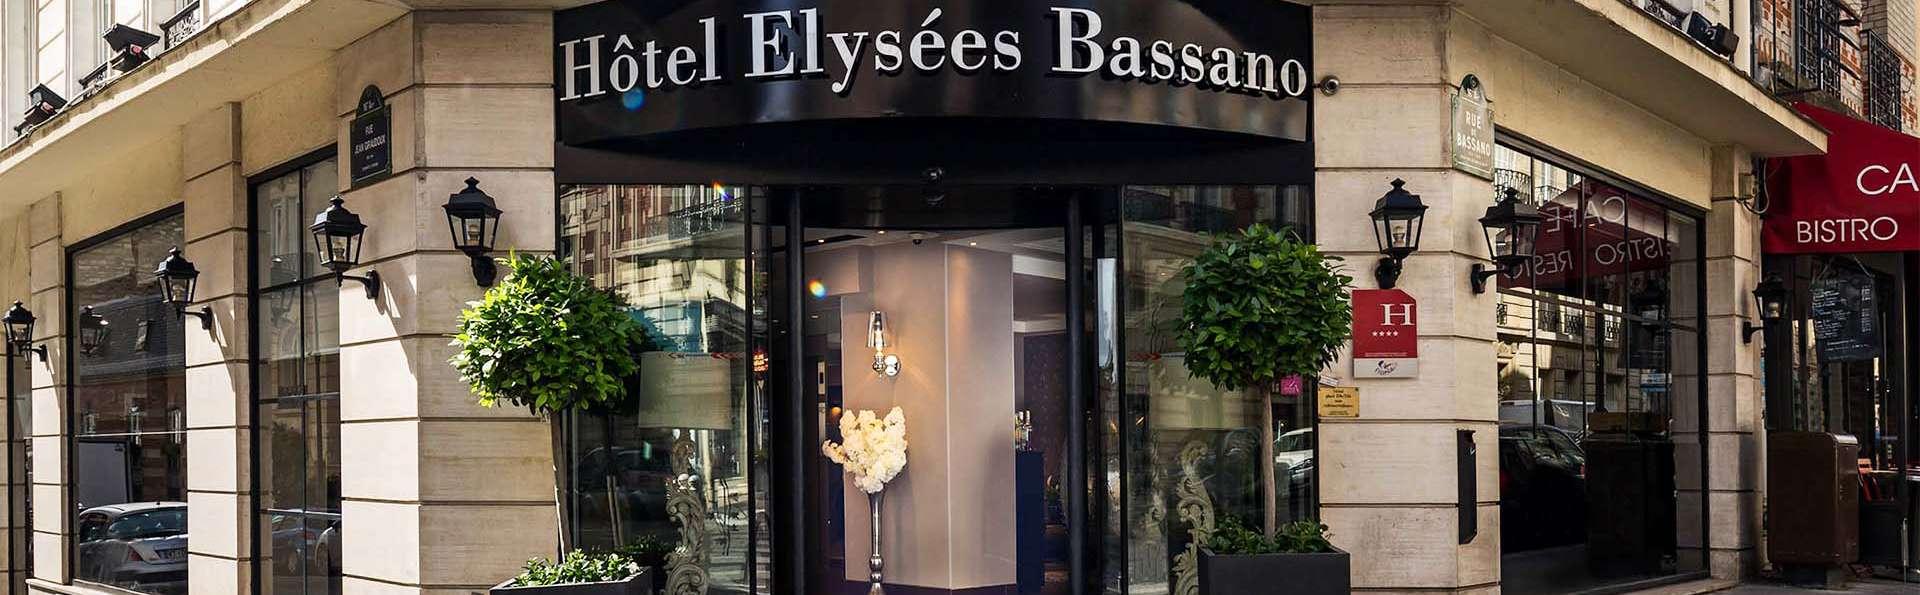 Hôtel Elysées Bassano - EDIT_facade_01.jpg